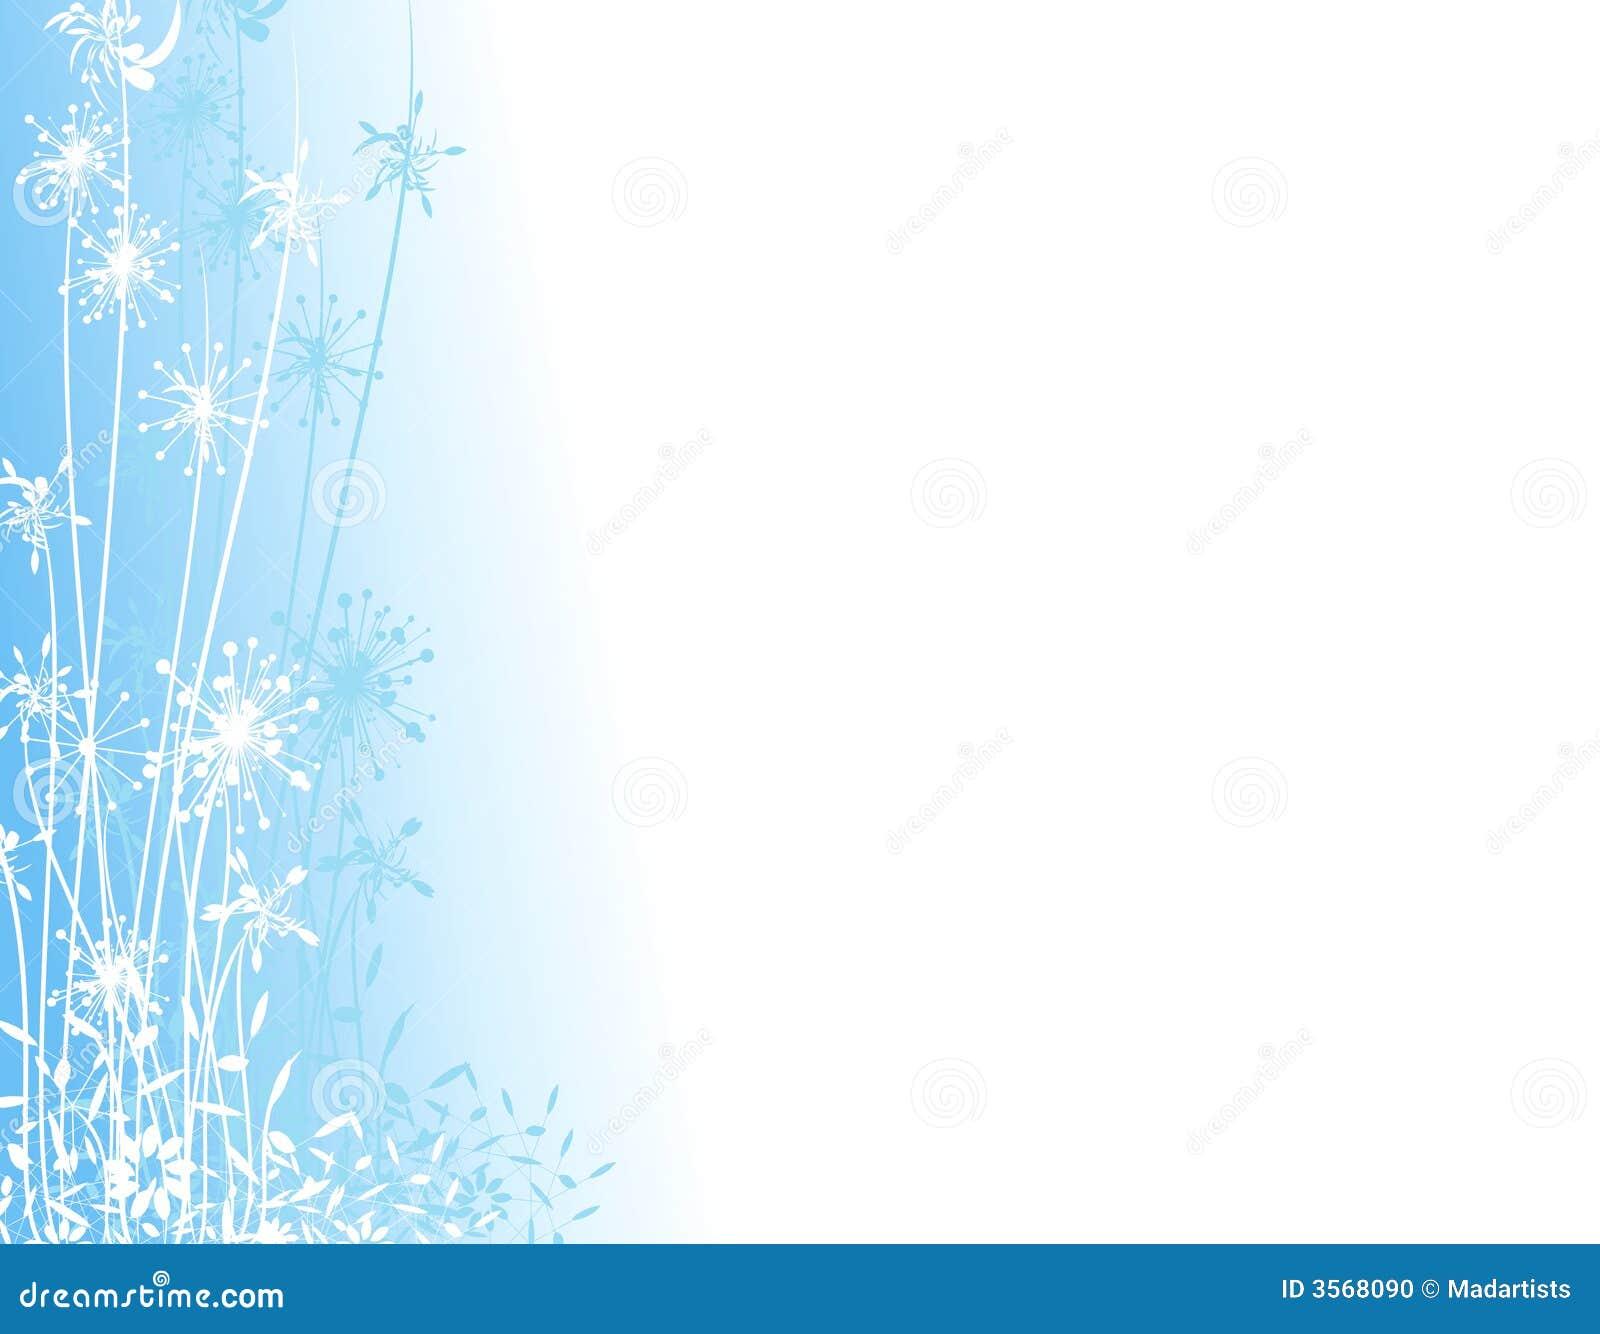 Blue Winter Garden Silhouette